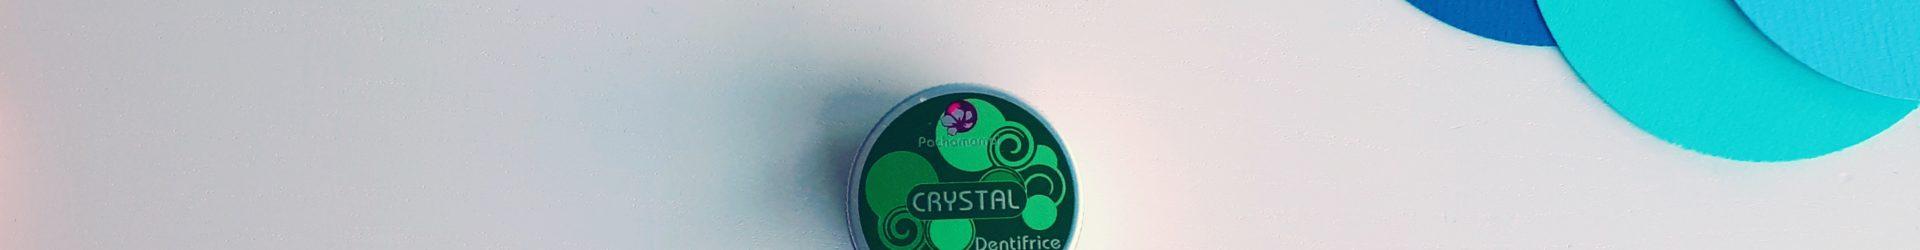 Pachamamaï – Dentifrice Crystal (20g)